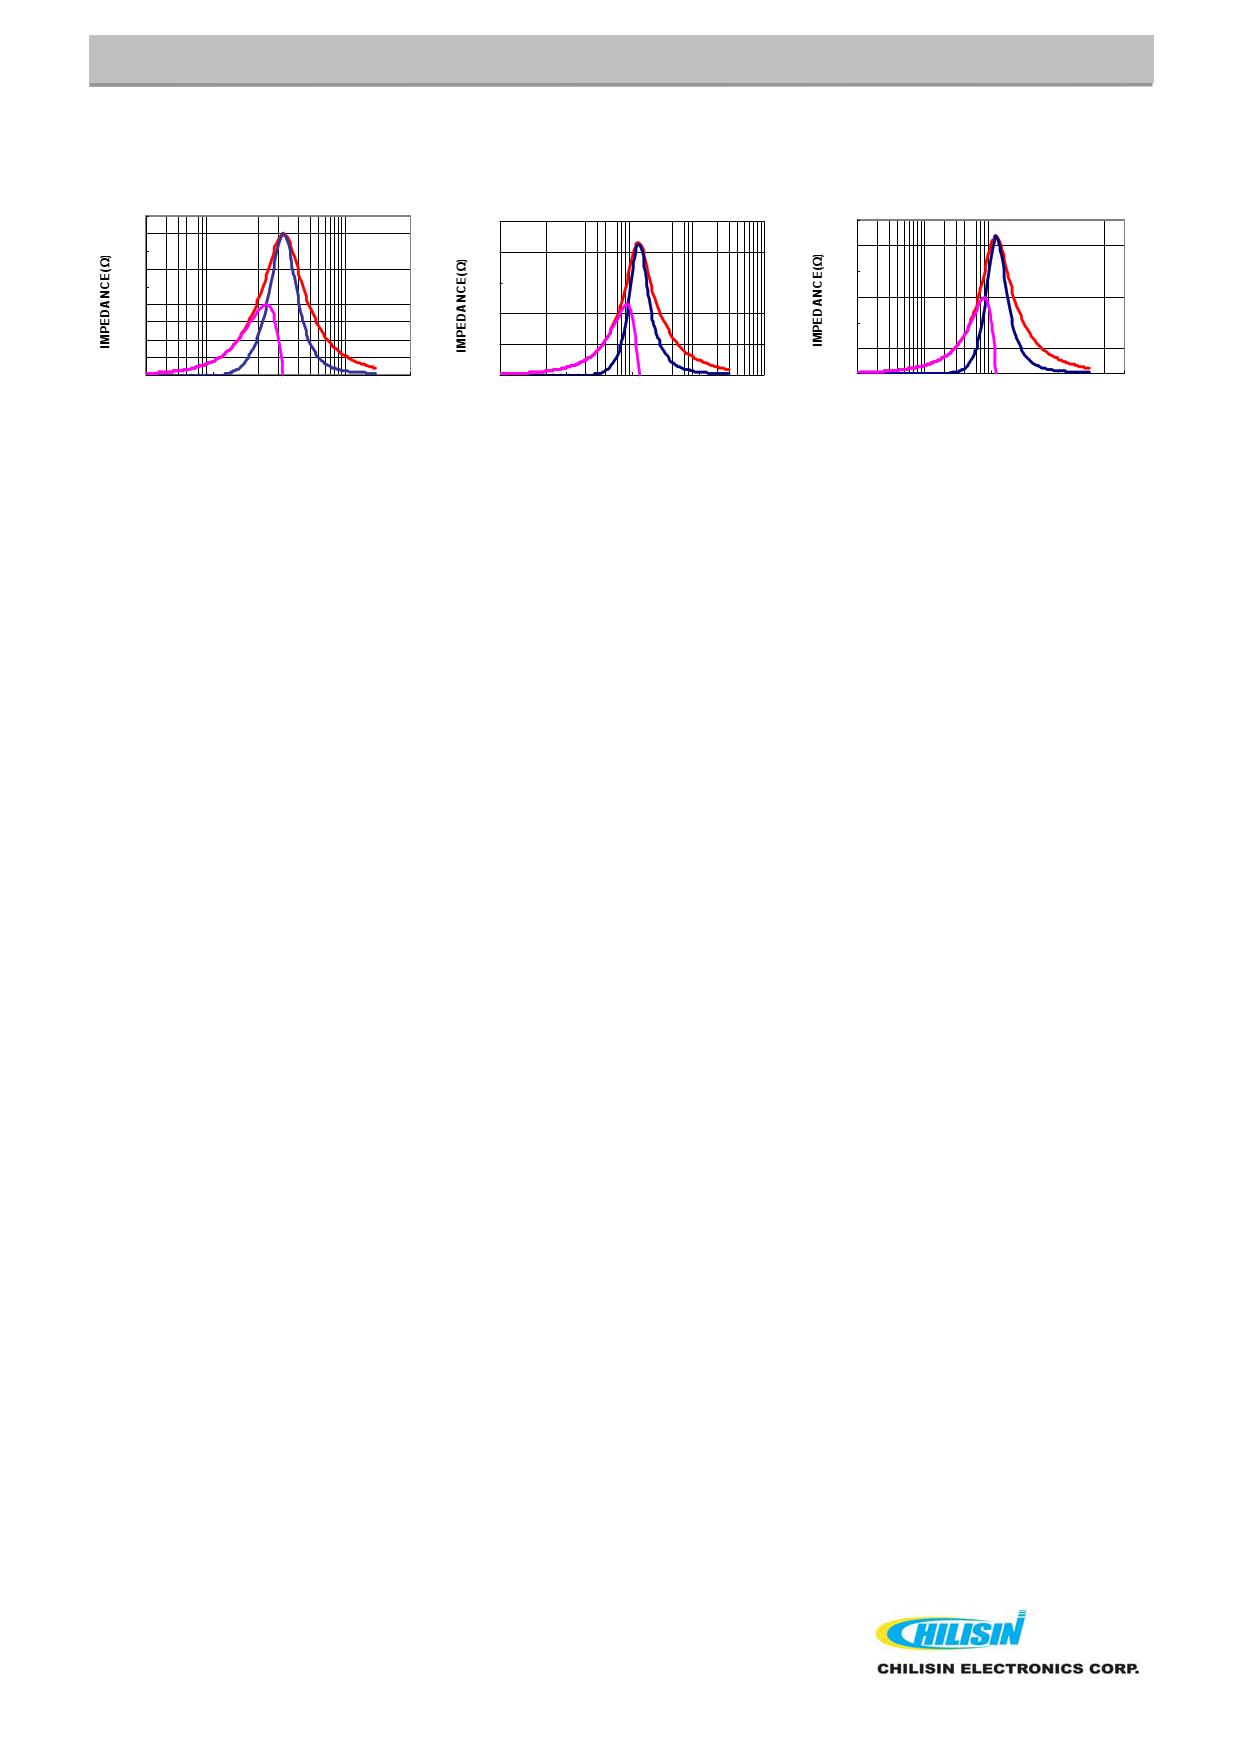 SBJ160808T pdf, 반도체, 판매, 대치품